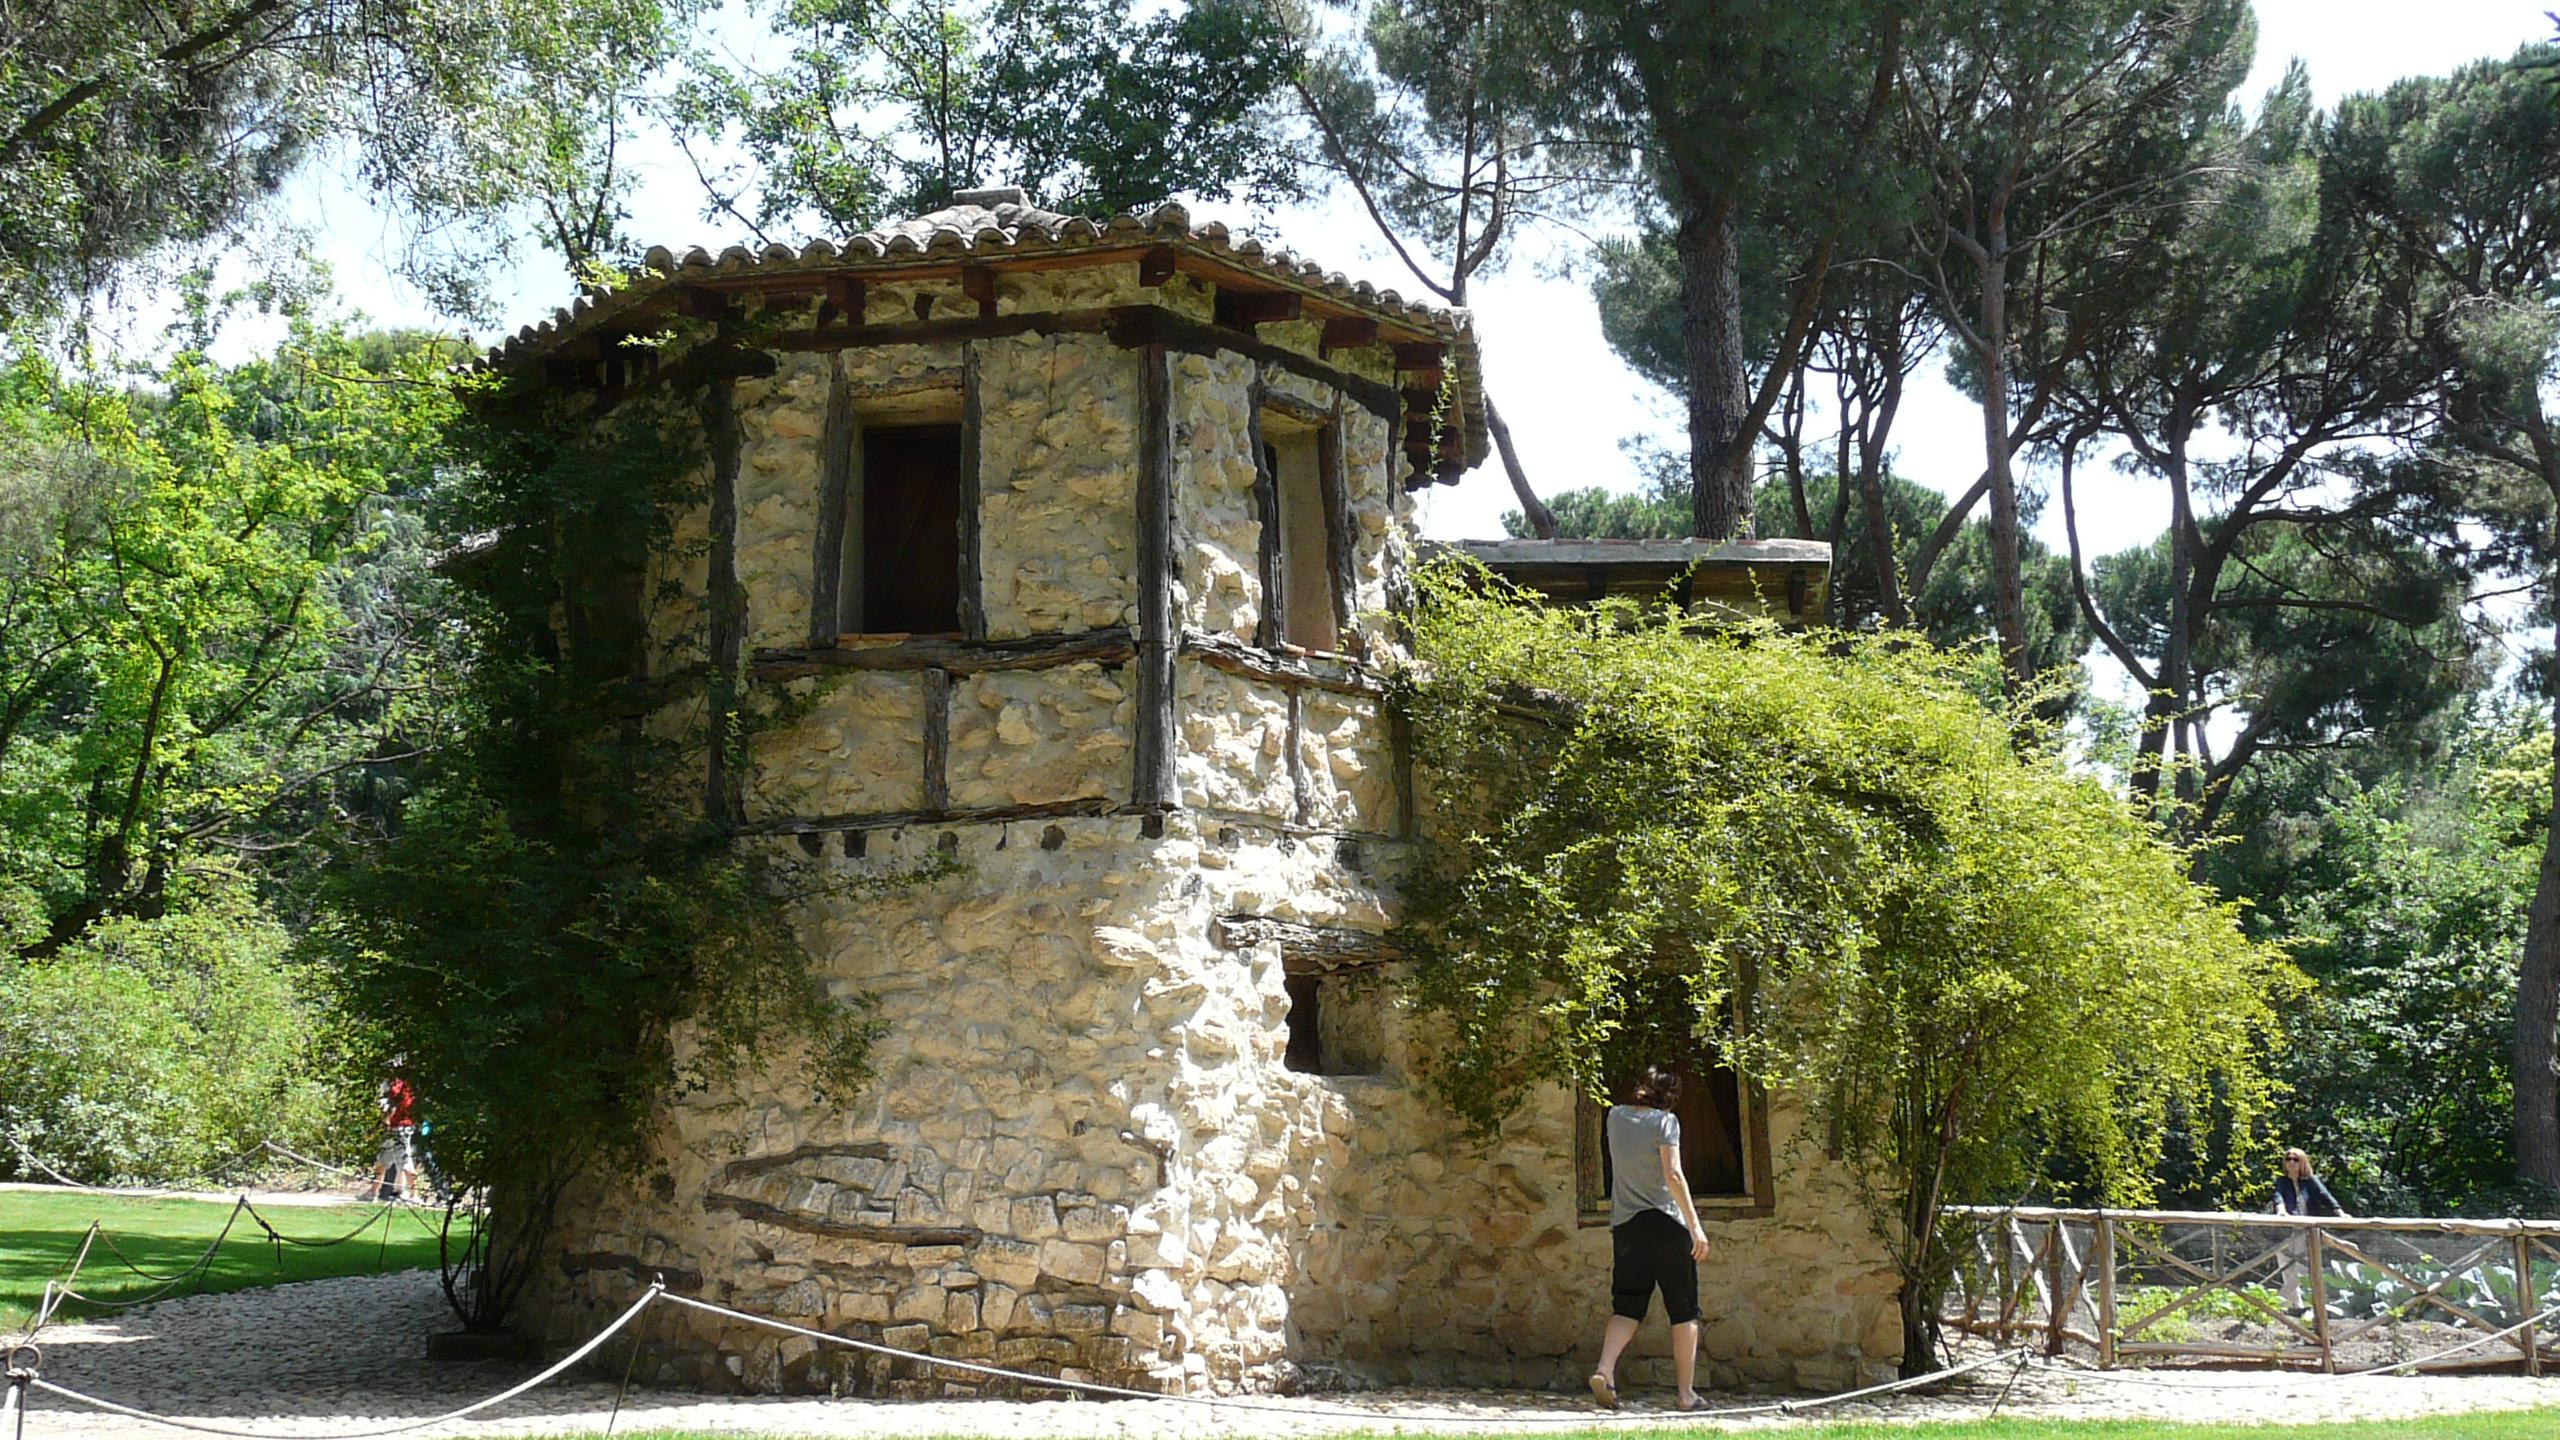 Parque del capricho roundalia for Jardines el capricho